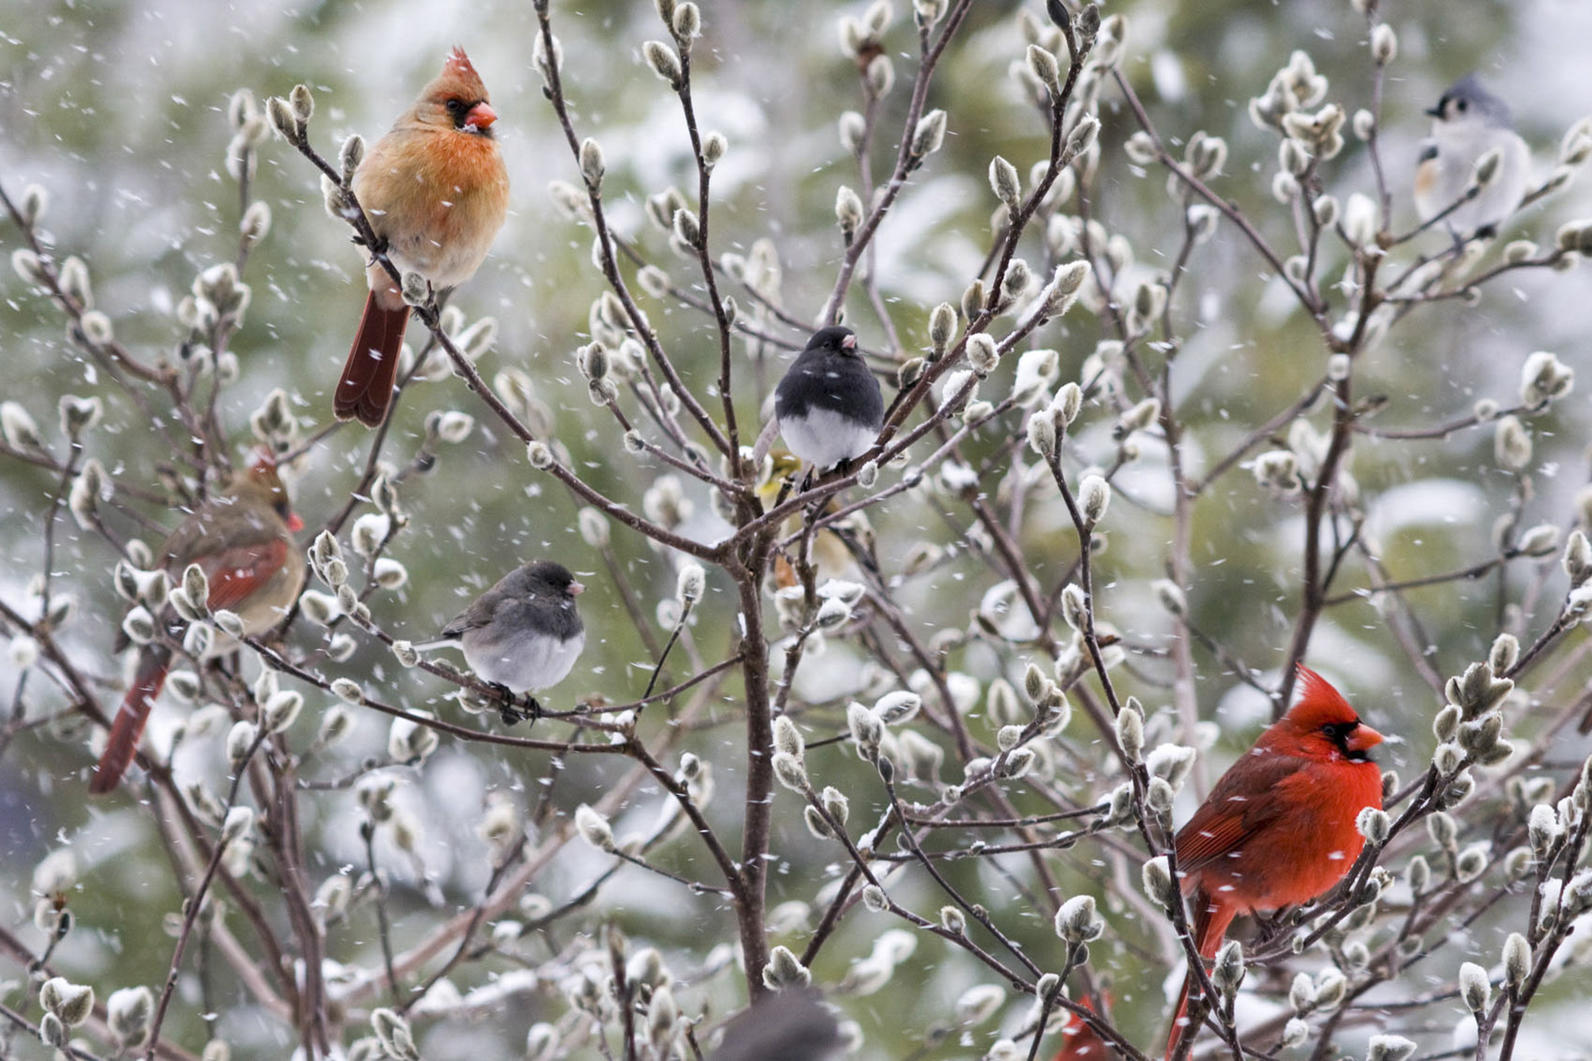 Michigan, Climate Watch, Community Science, Volunteer, Winter Birds